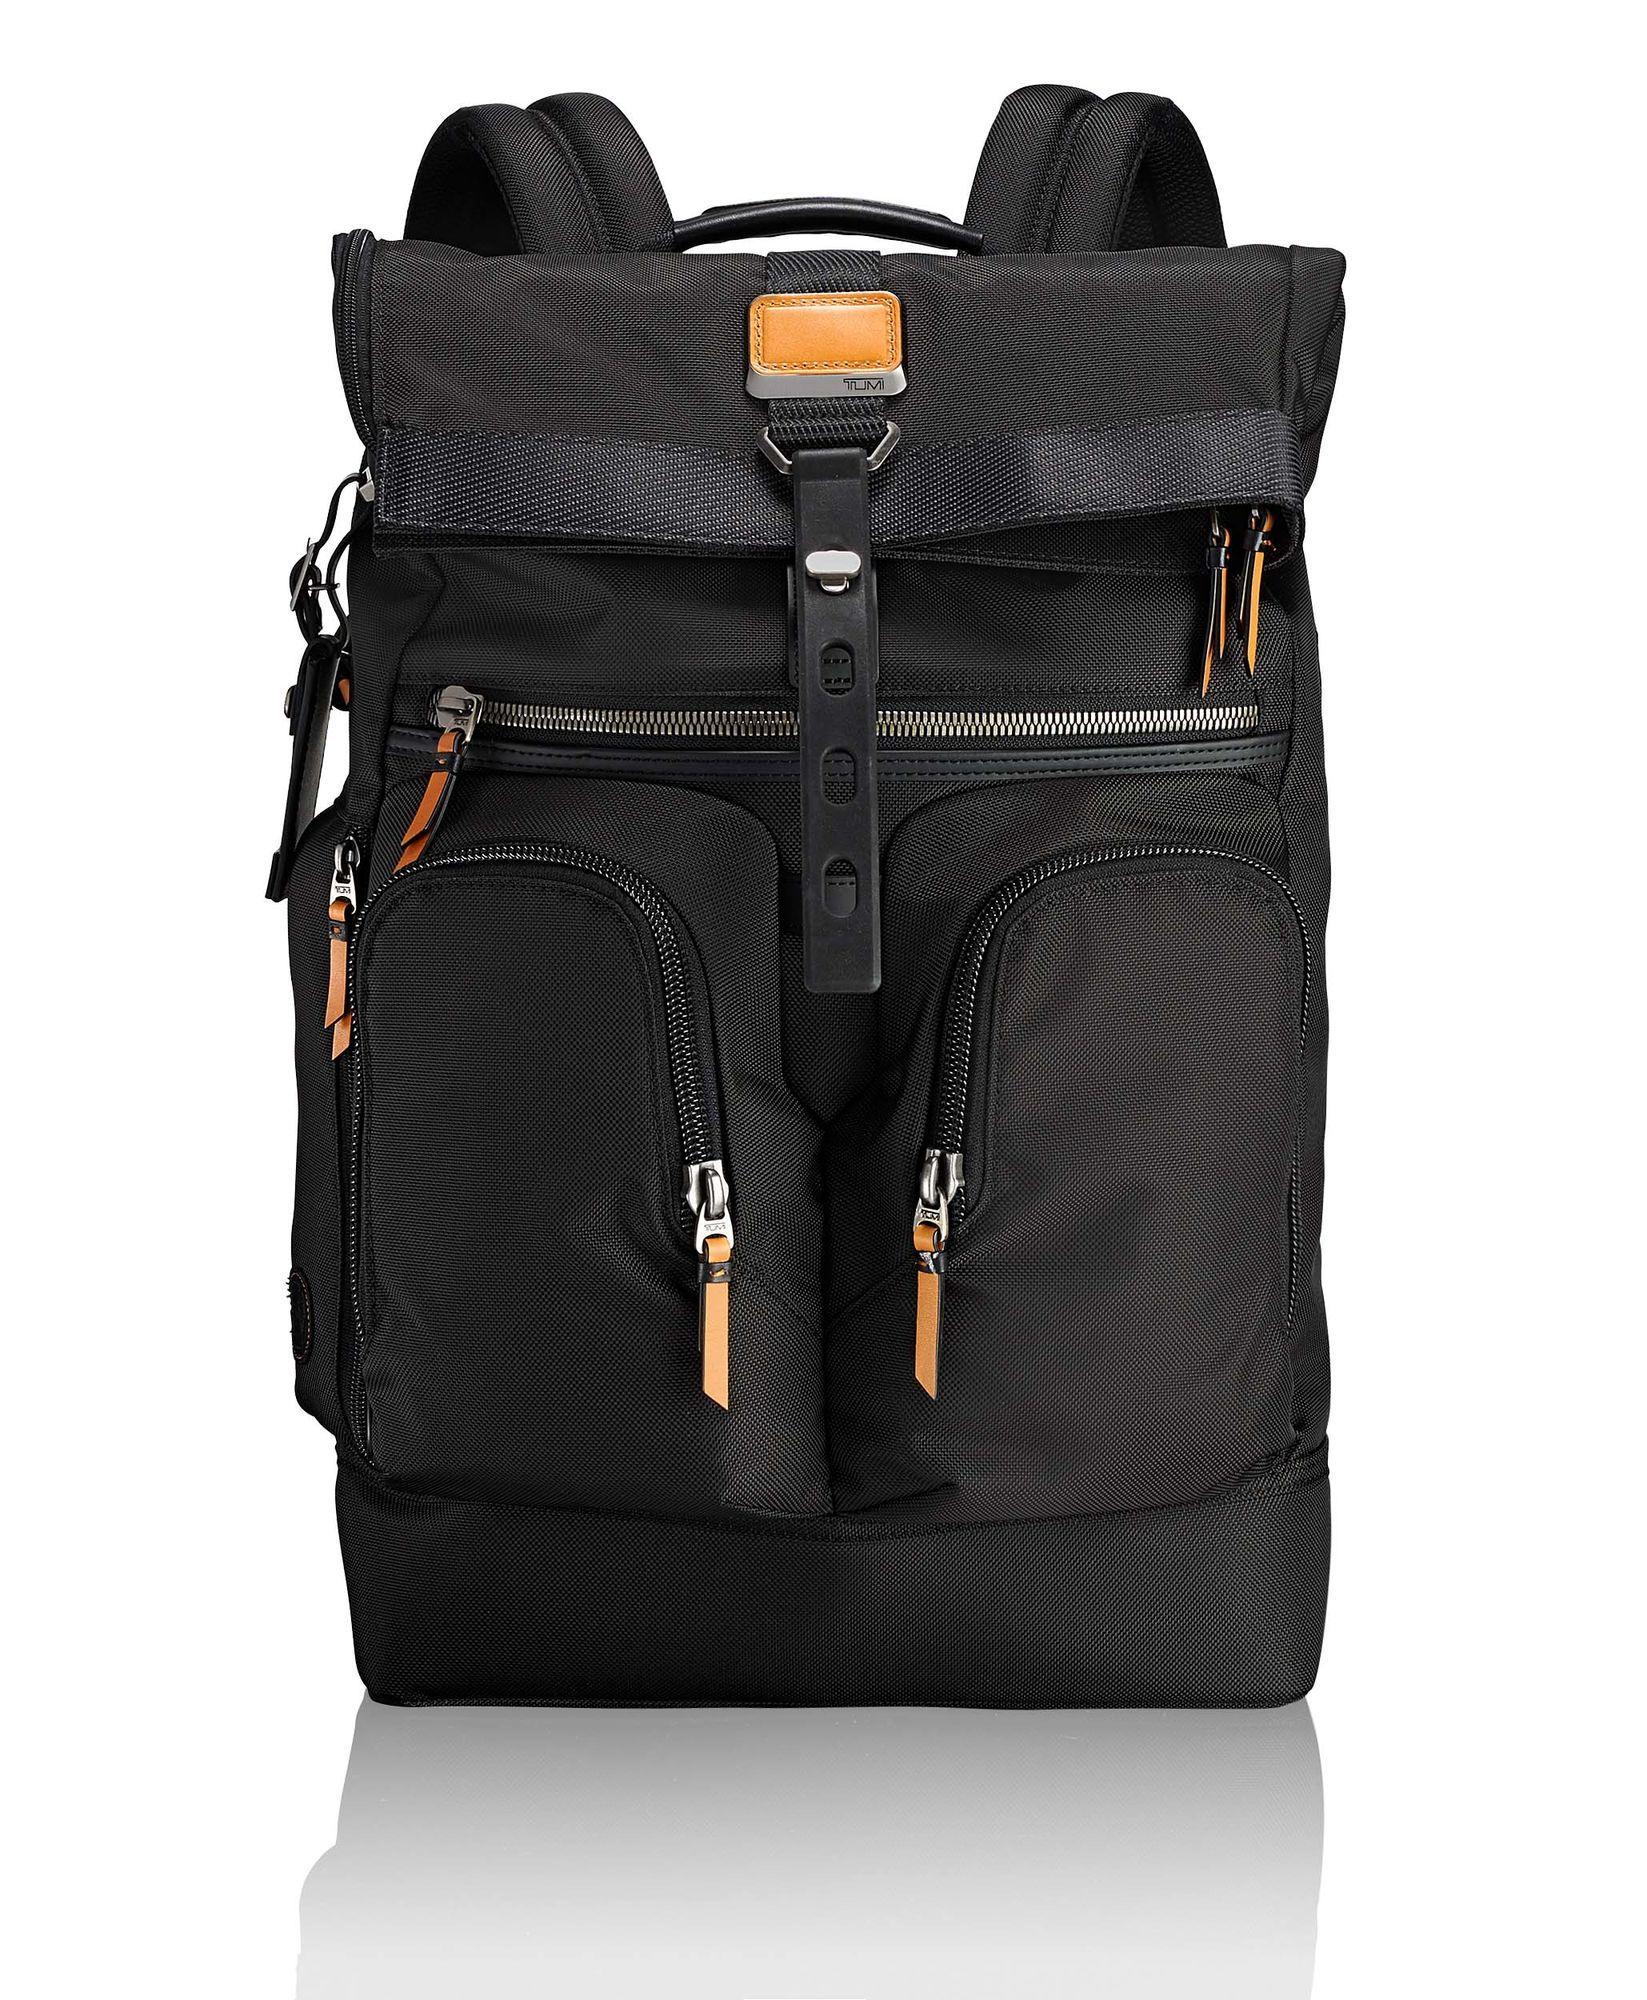 4336faf9b London Roll Top Backpack Alpha Bravo   Stuff I Want   Backpacks, Top ...